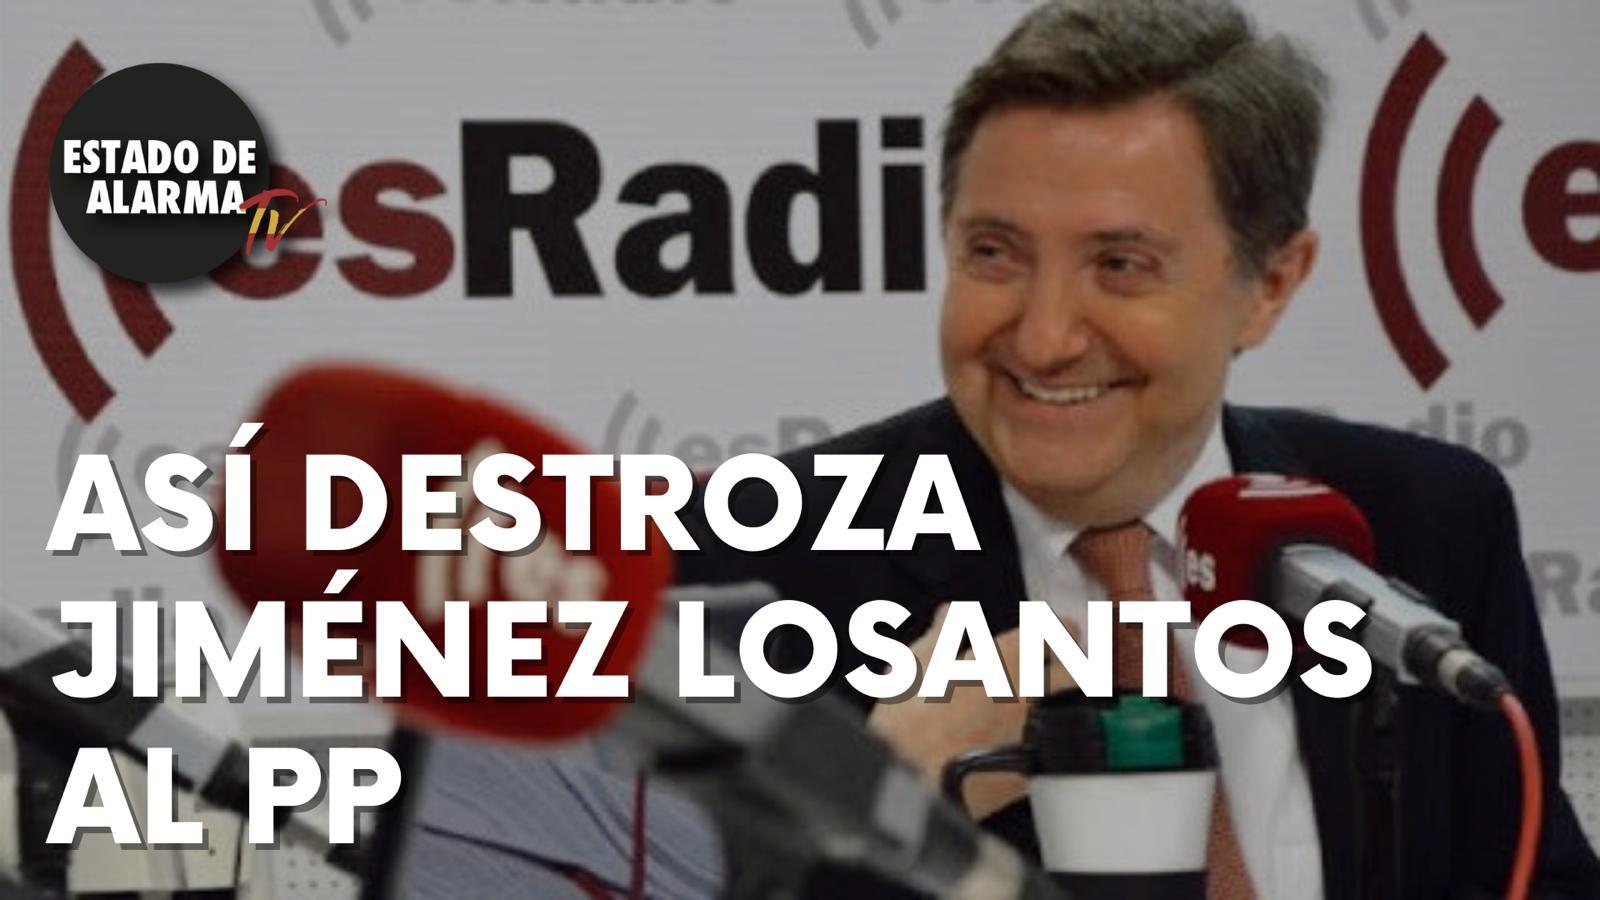 Así DESTROZA Jiménez LOSANTOS al PP